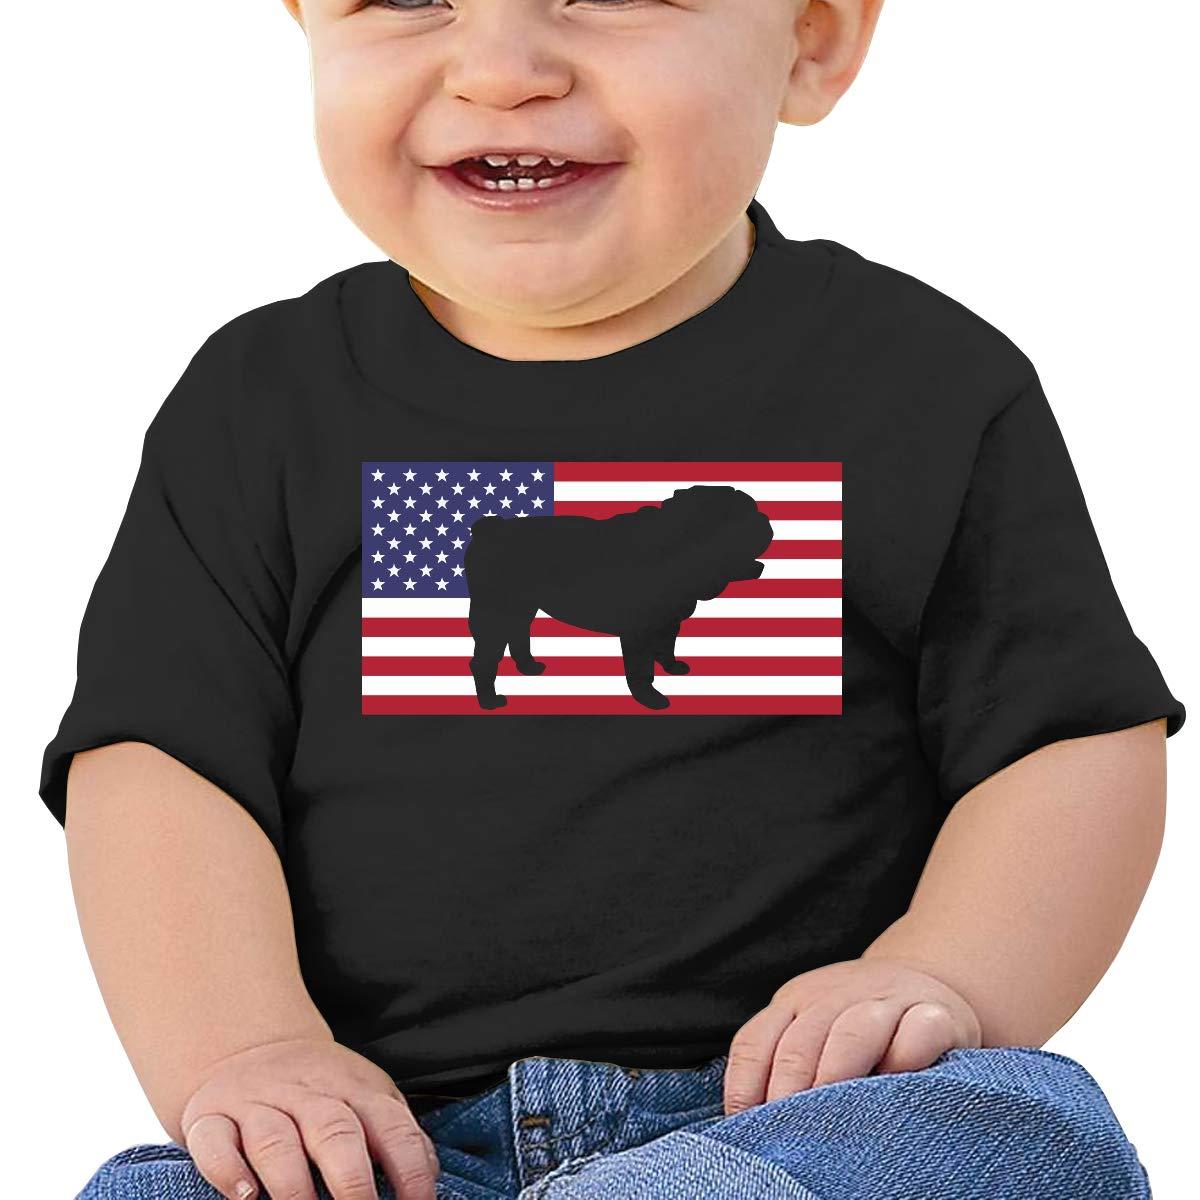 English Bulldog USA Flag Newborn Baby Short Sleeve Crew Neck T Shirts 6-18 Month Tops